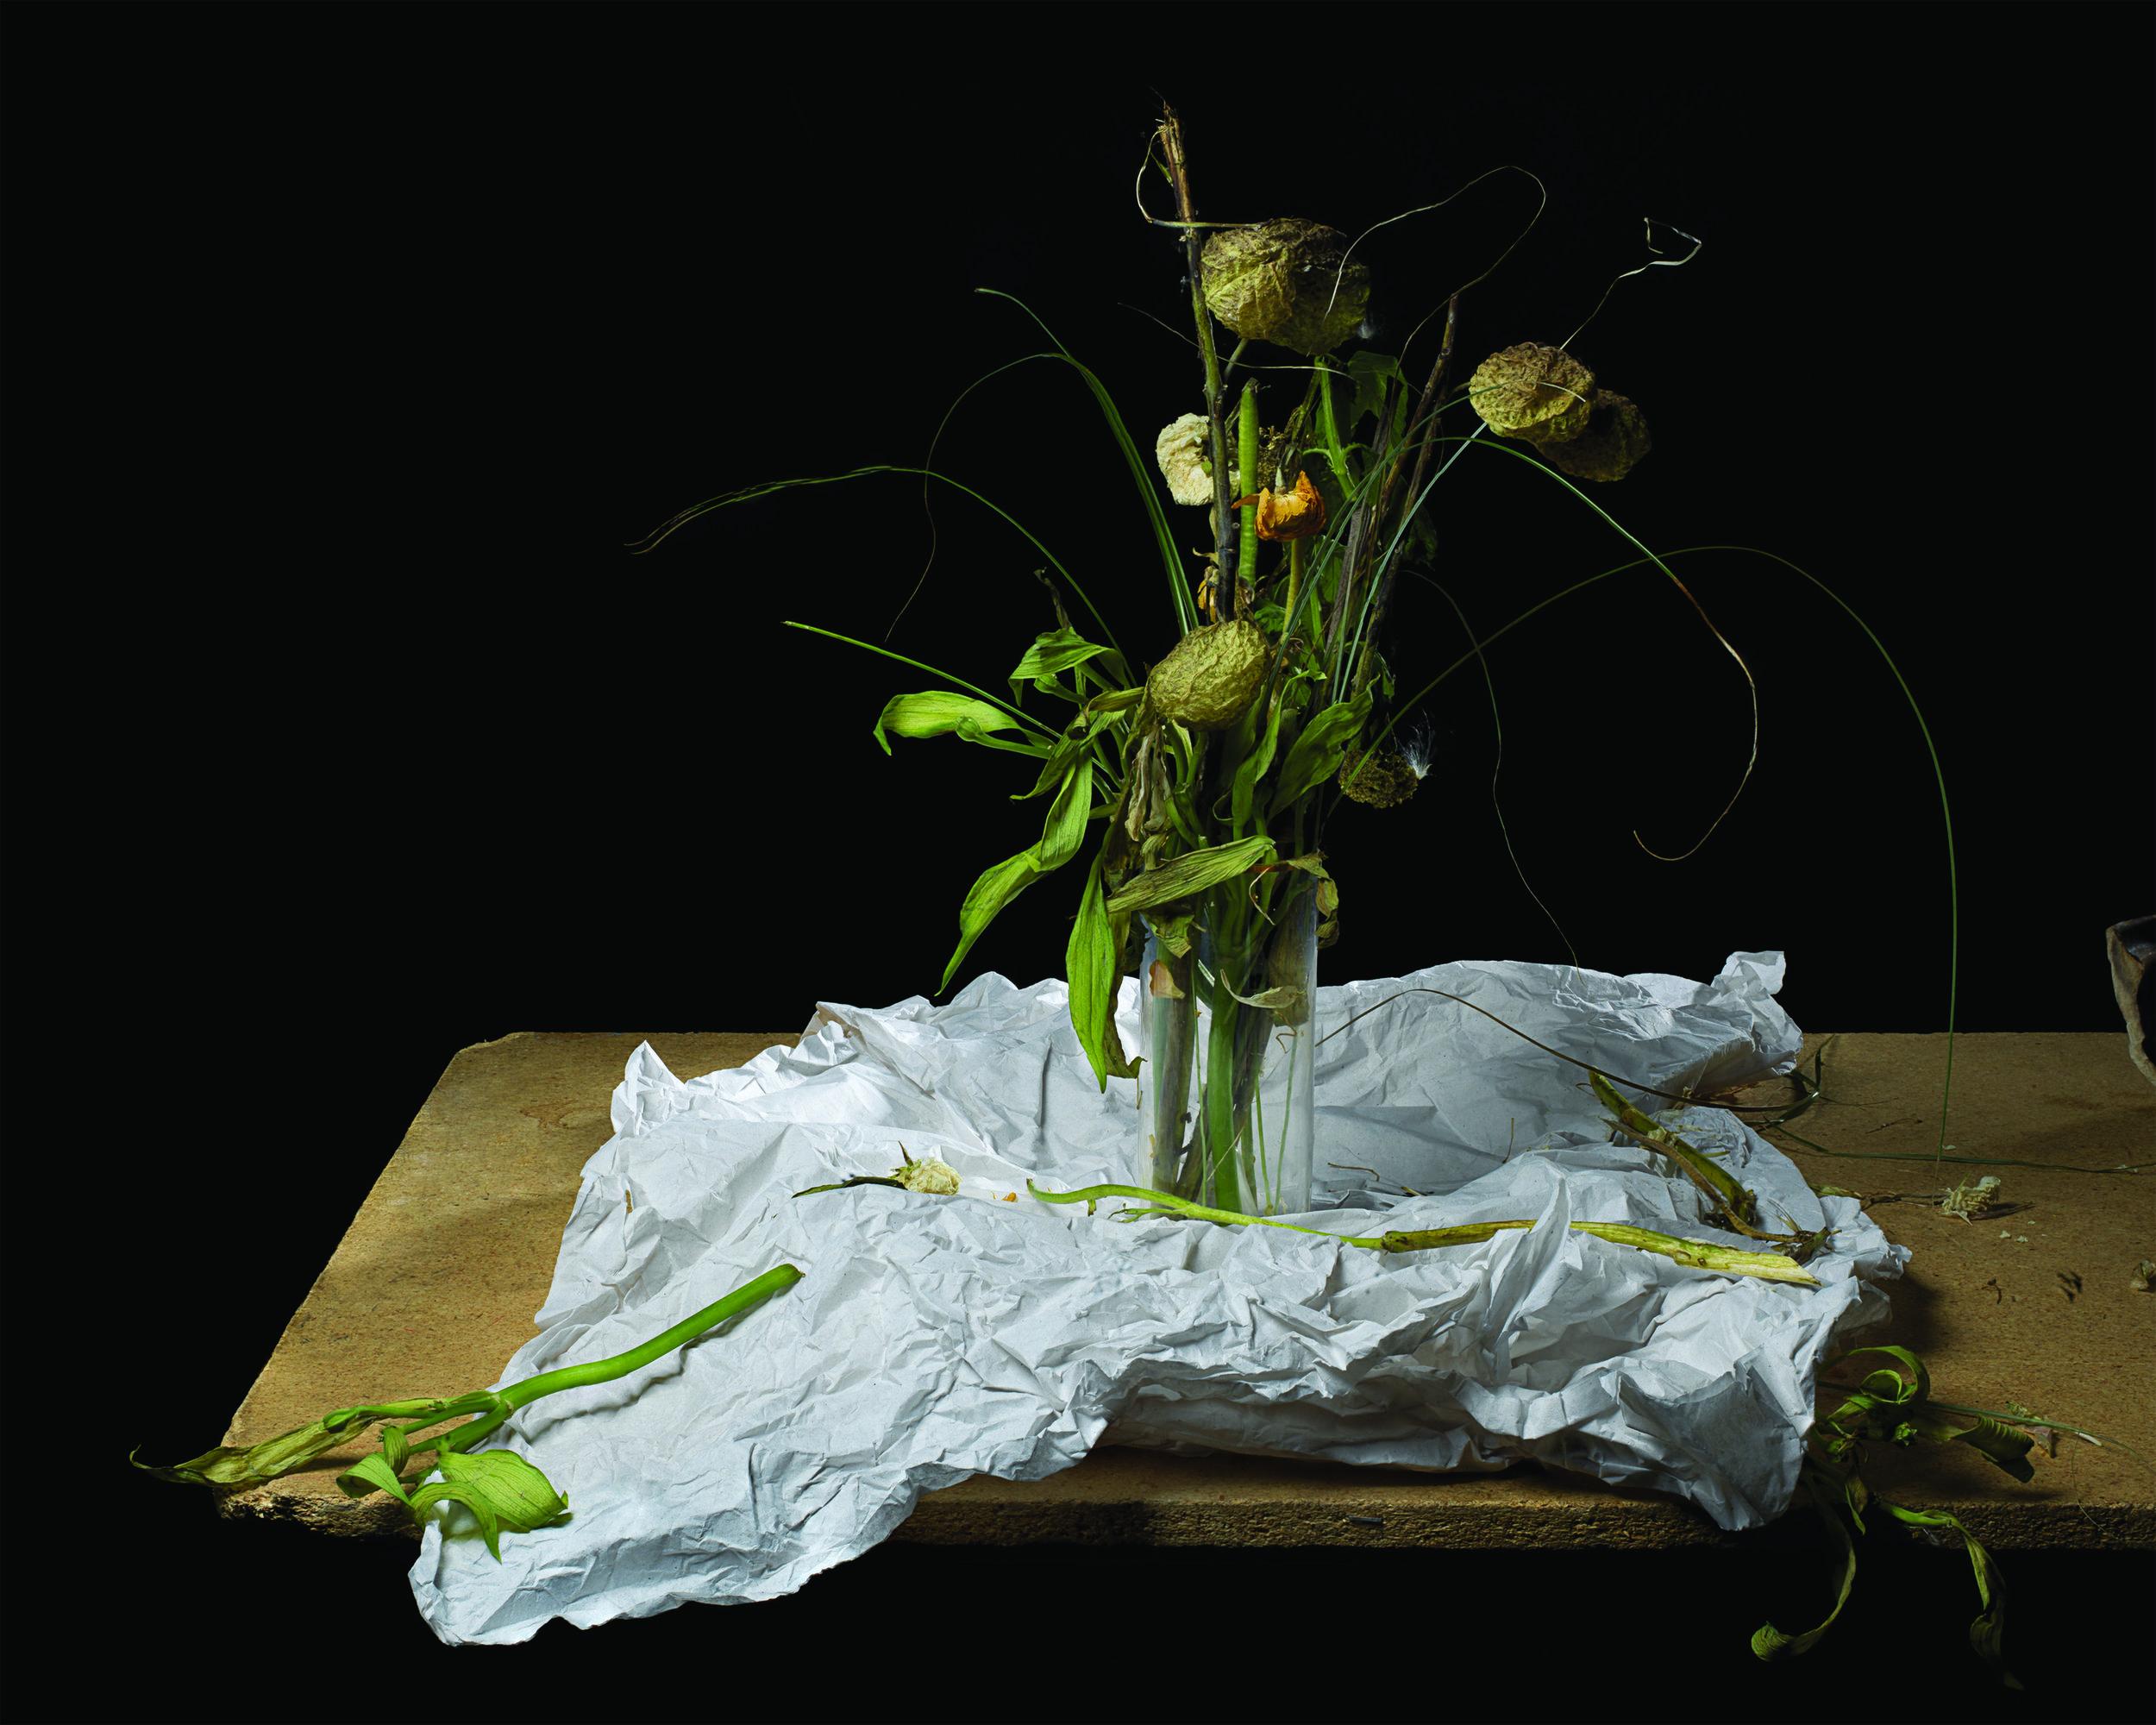 Zhe Zhu, Floating 漂浮 , 2013.archival pigment print on fine art paper,24 x 30 in. (61 x 76 cm),edition of 12 + 2 AP.© 2017 Zhe Zhu, courtesy Fou Gallery